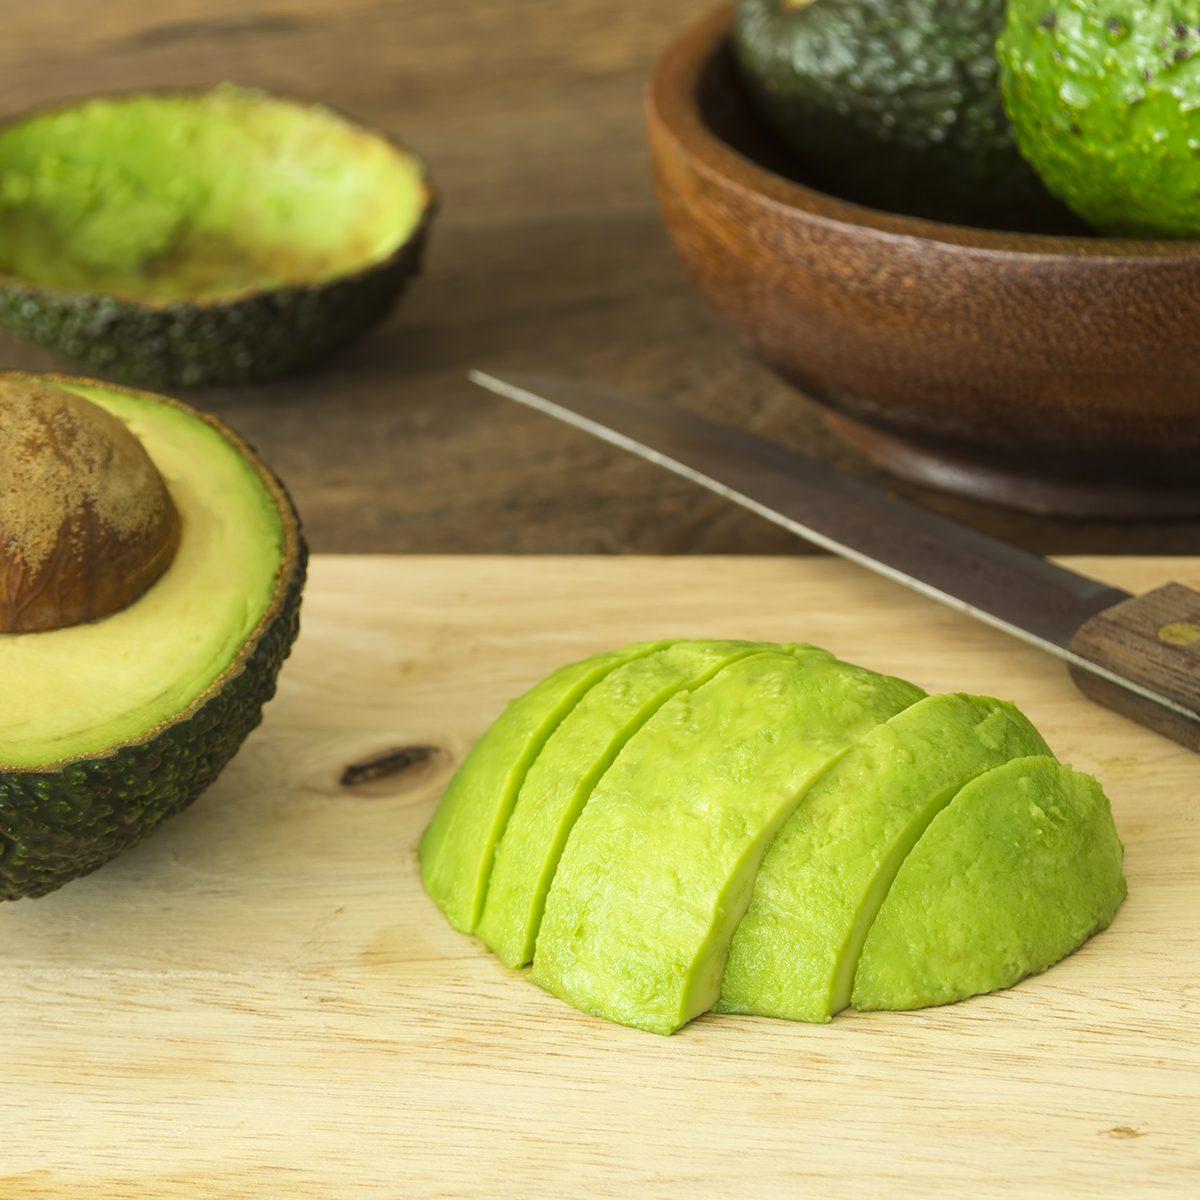 fruits for diabetics avocado and Sliced avocado slices on wooden board